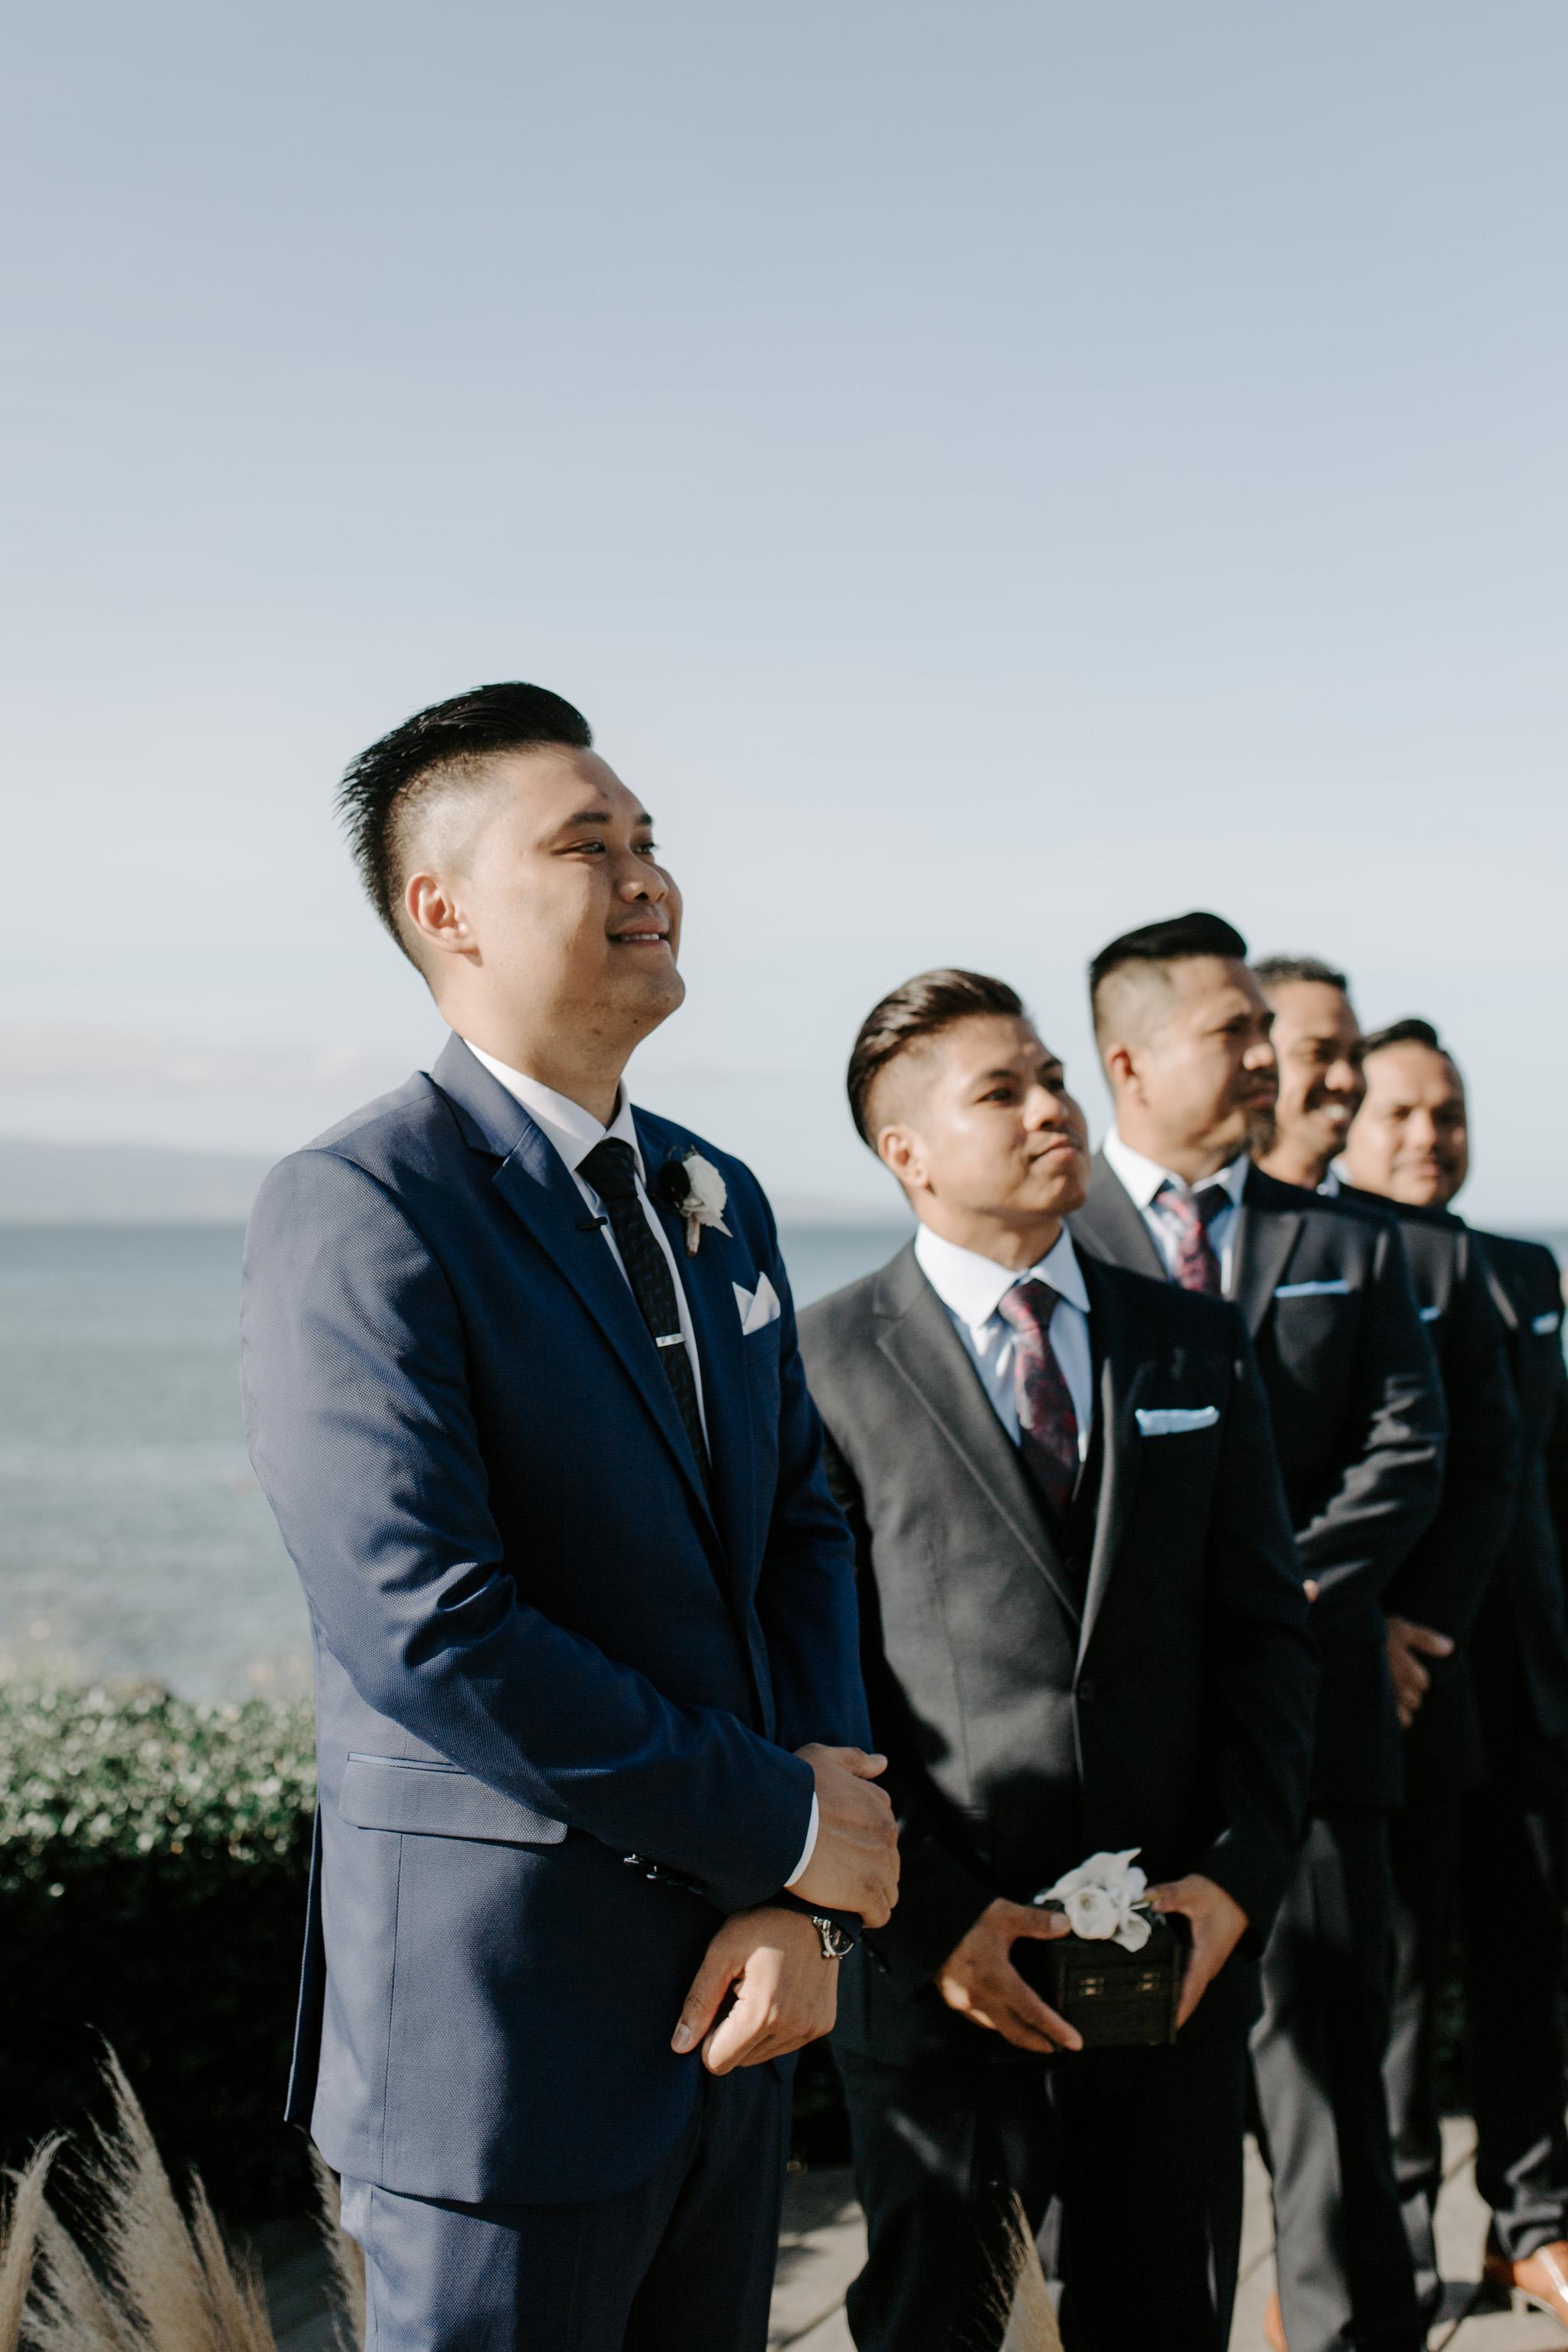 Groom's reaction seeing bride walk down the aisle   Merriman's Kapalua Maui wedding by Hawaii wedding photographer Desiree Leilani